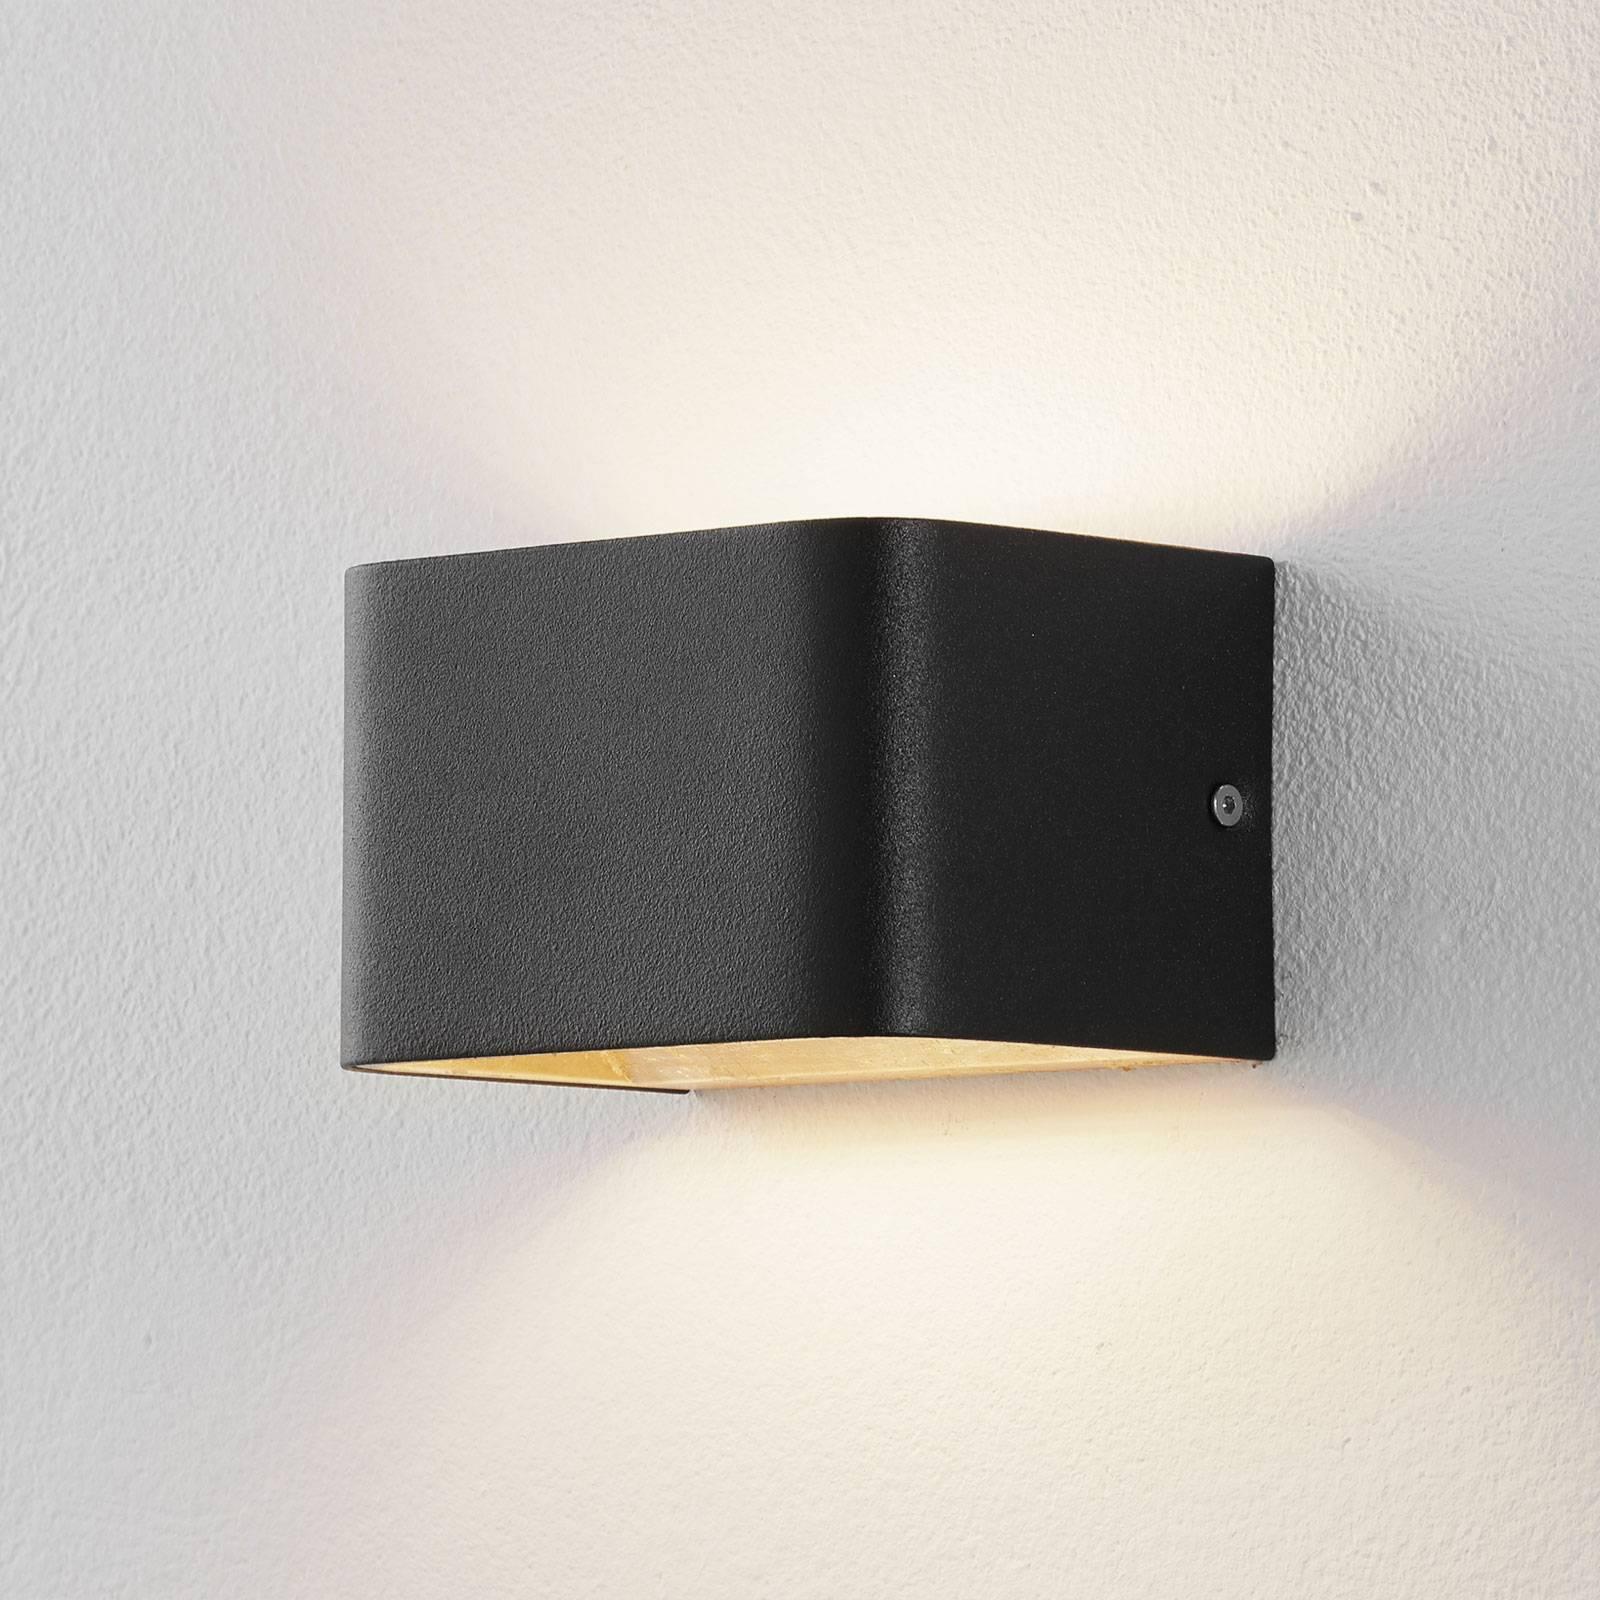 Lucande Sessa LED wandlamp 13cm zwart-goud